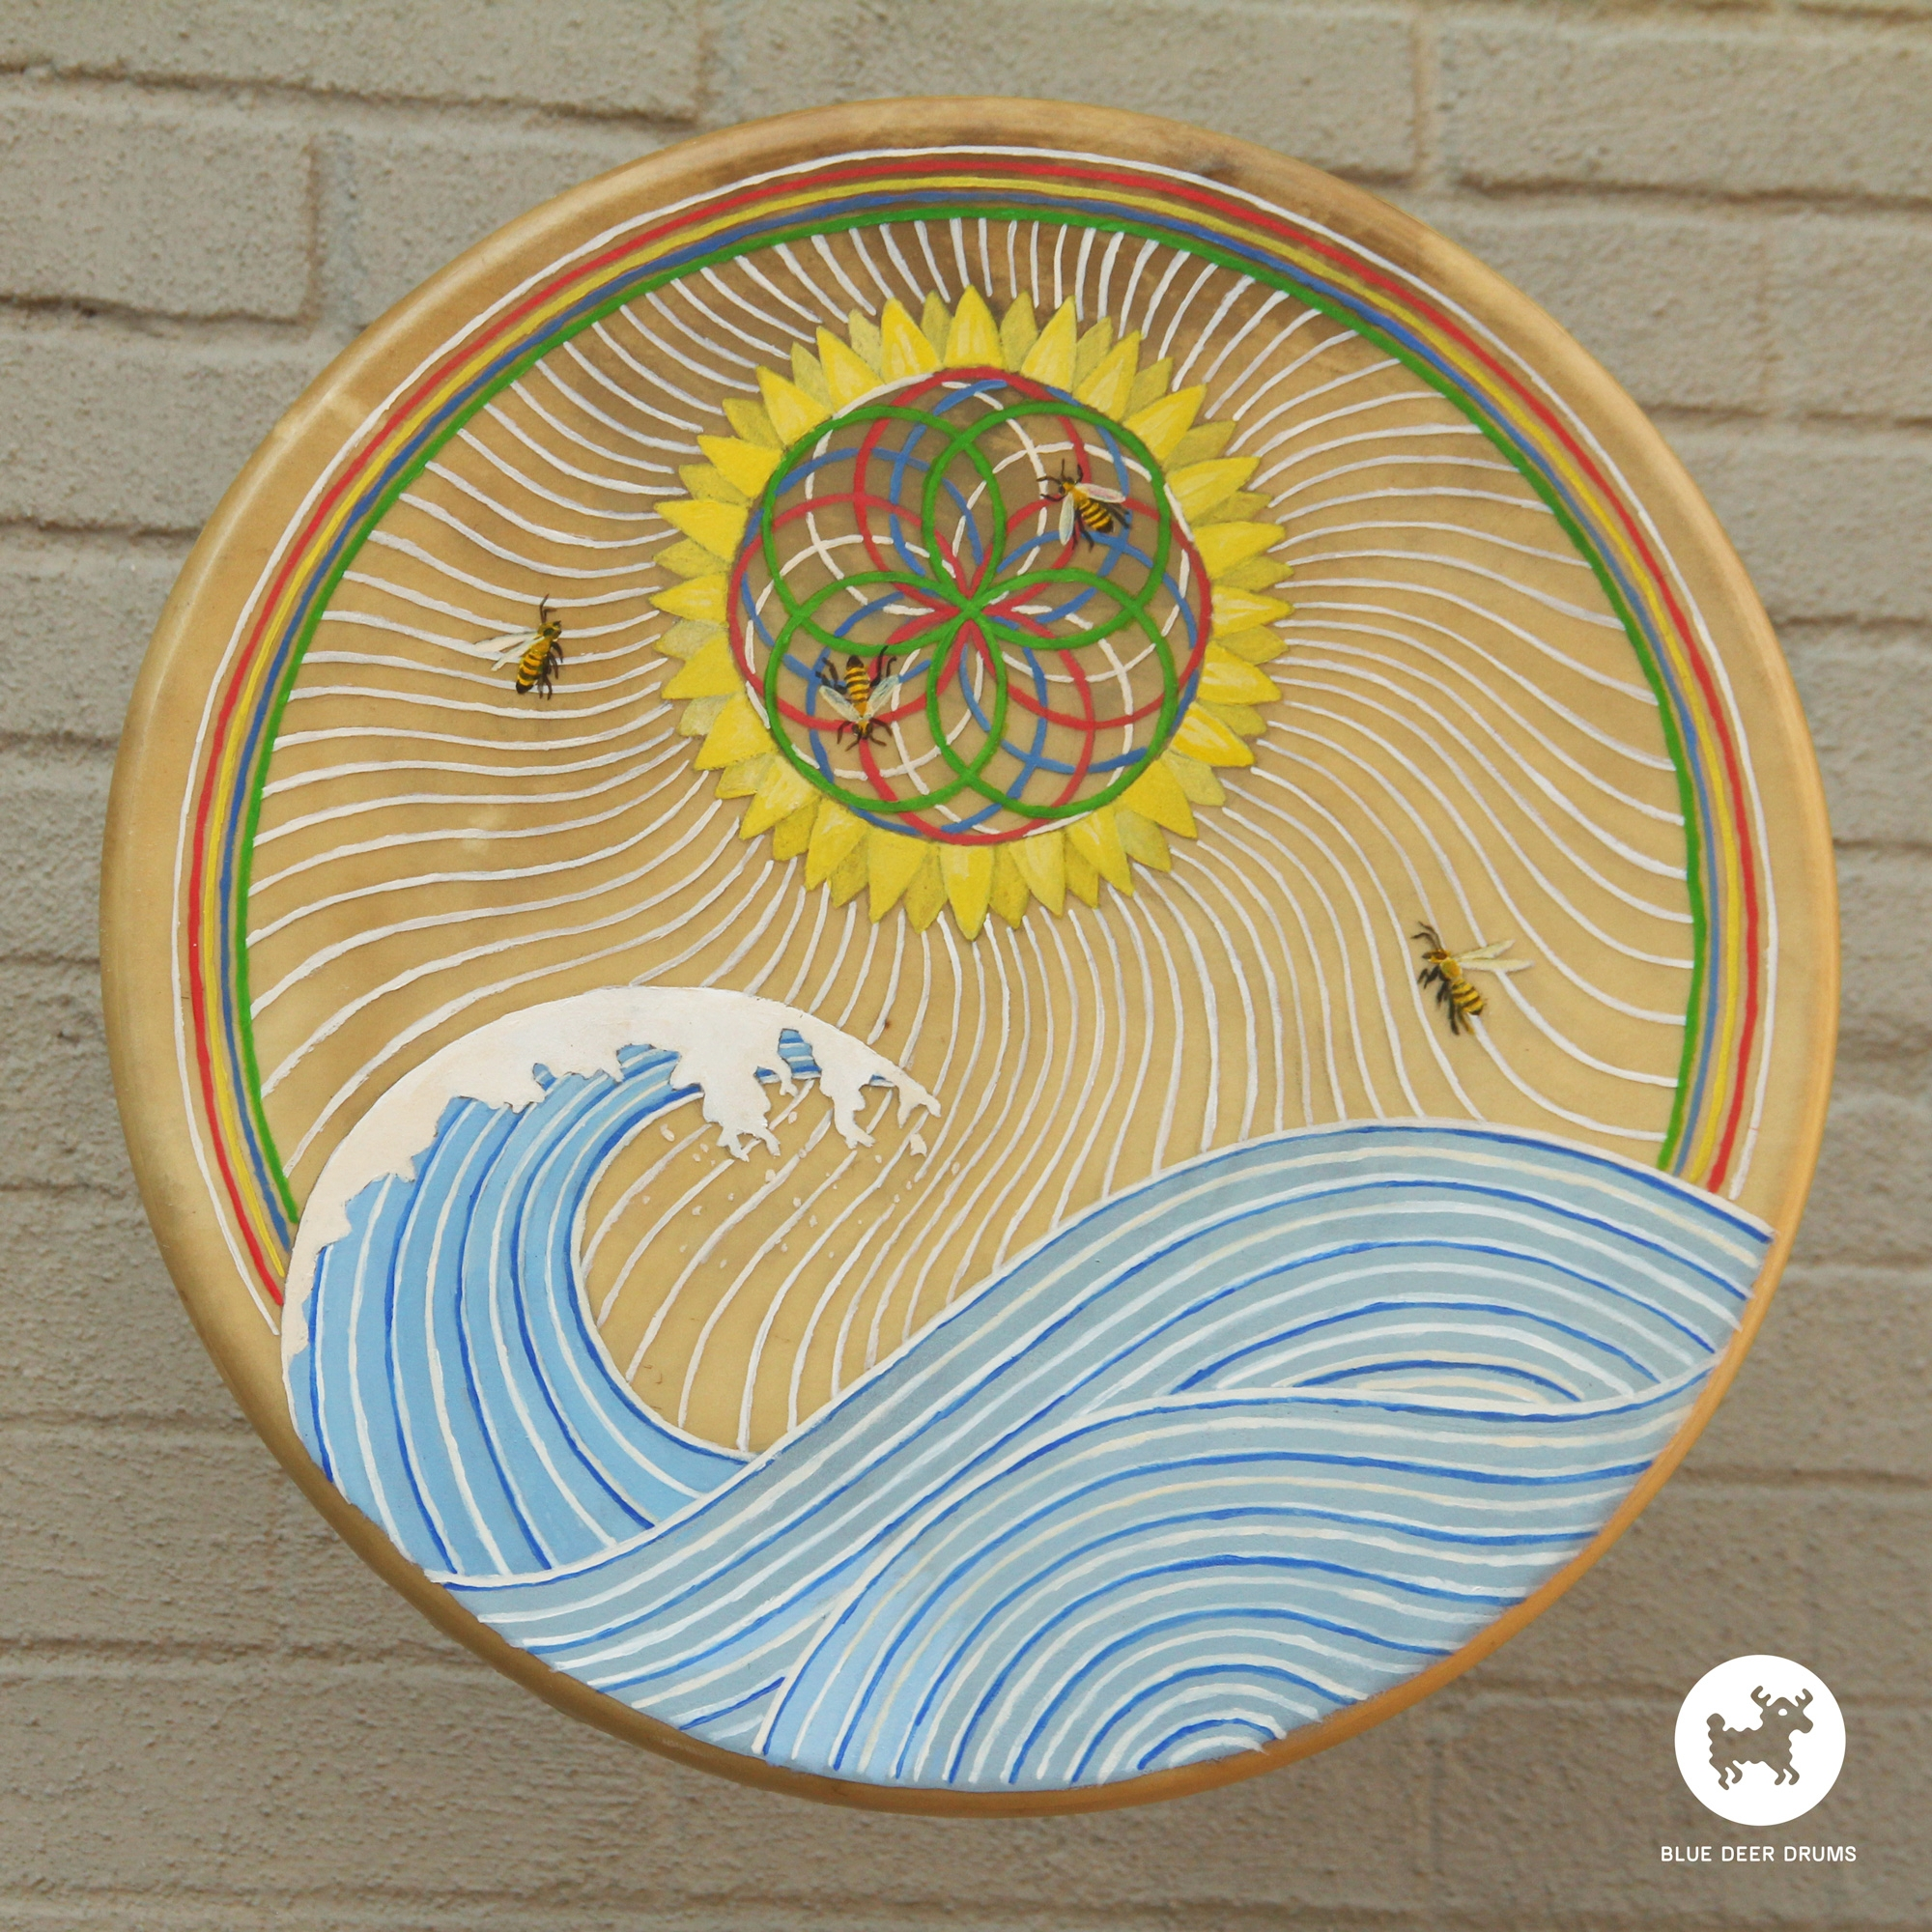 blue-deer-drums-painting-brooklyn-shamanic-sound-healing-bath-workshop-bag-ceremony-drumstick-spirit-bees-wave-ocean